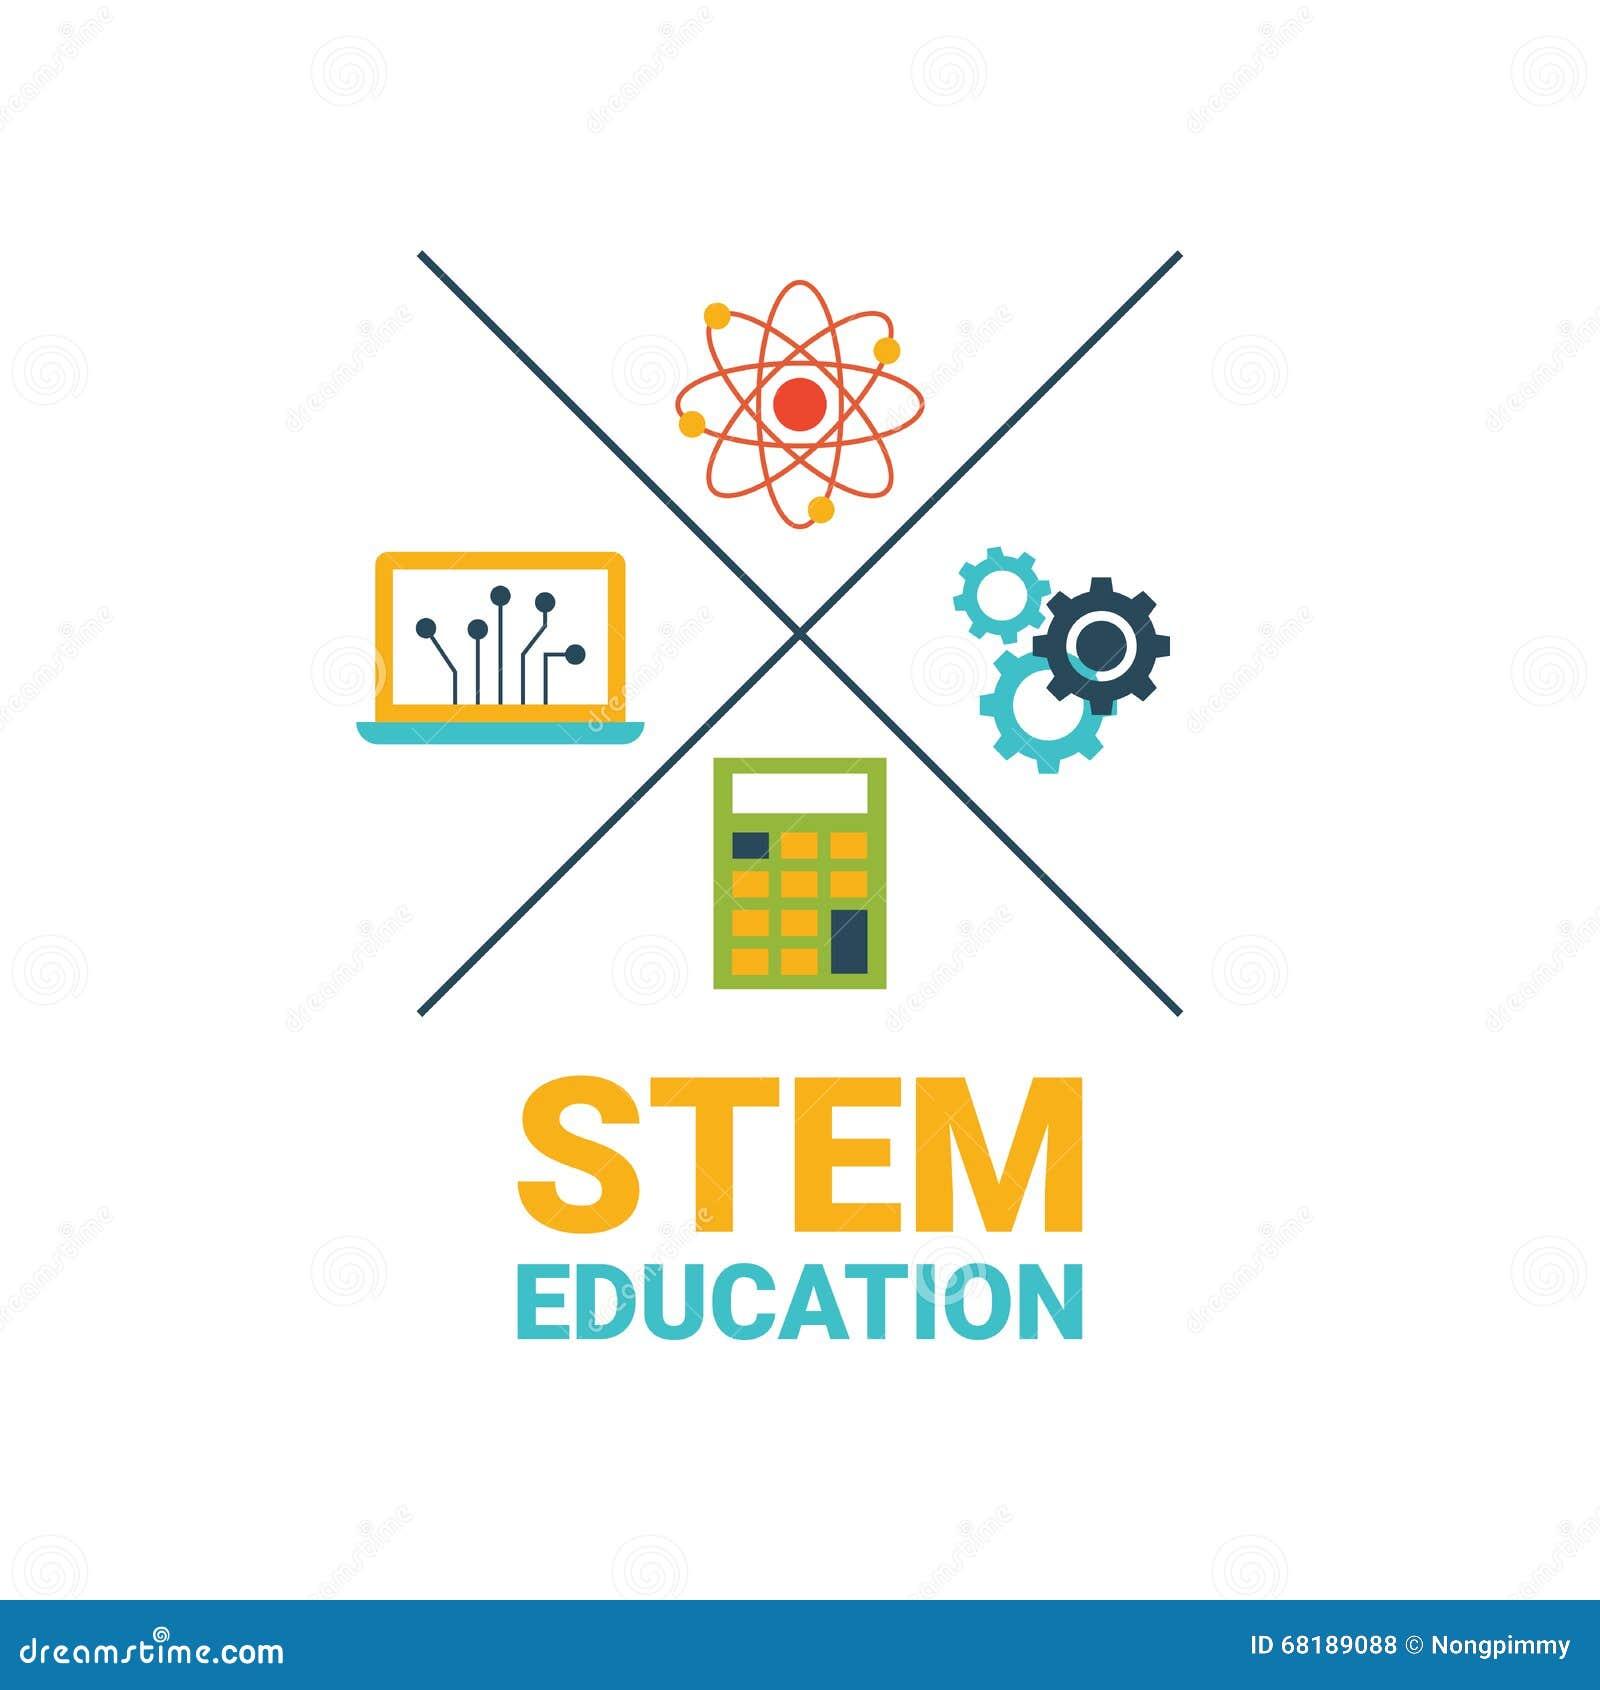 Stem Education: STEM Education Concept Stock Vector. Illustration Of Math